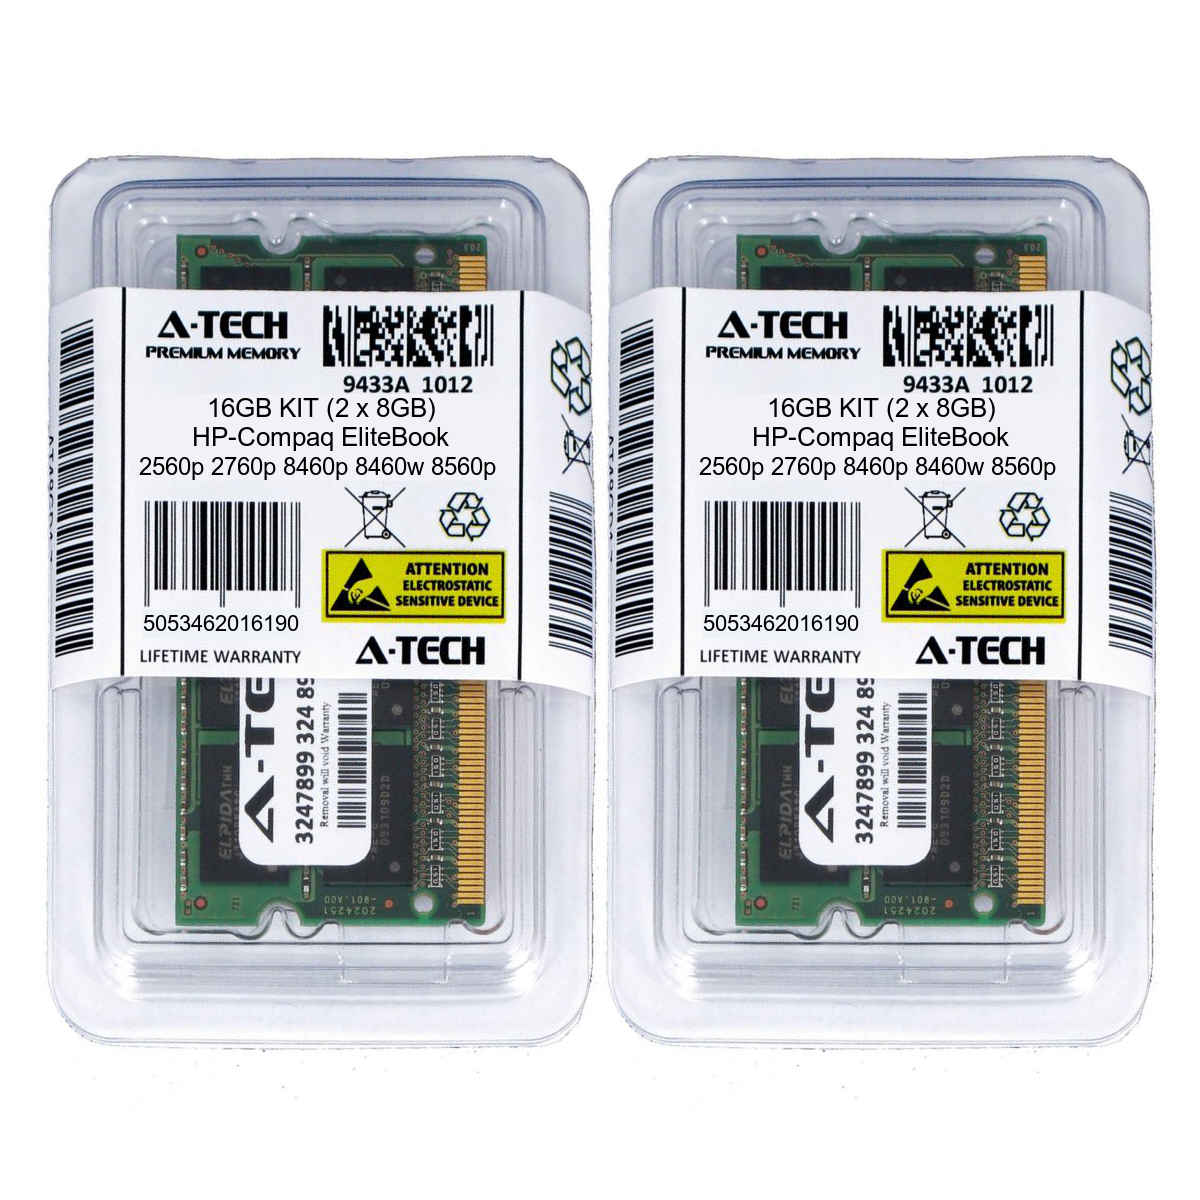 16GB KIT 2 x 8GB HP EliteBook 840 G1 2560p 2760p 8460p 8460w 8560p Memory Ram